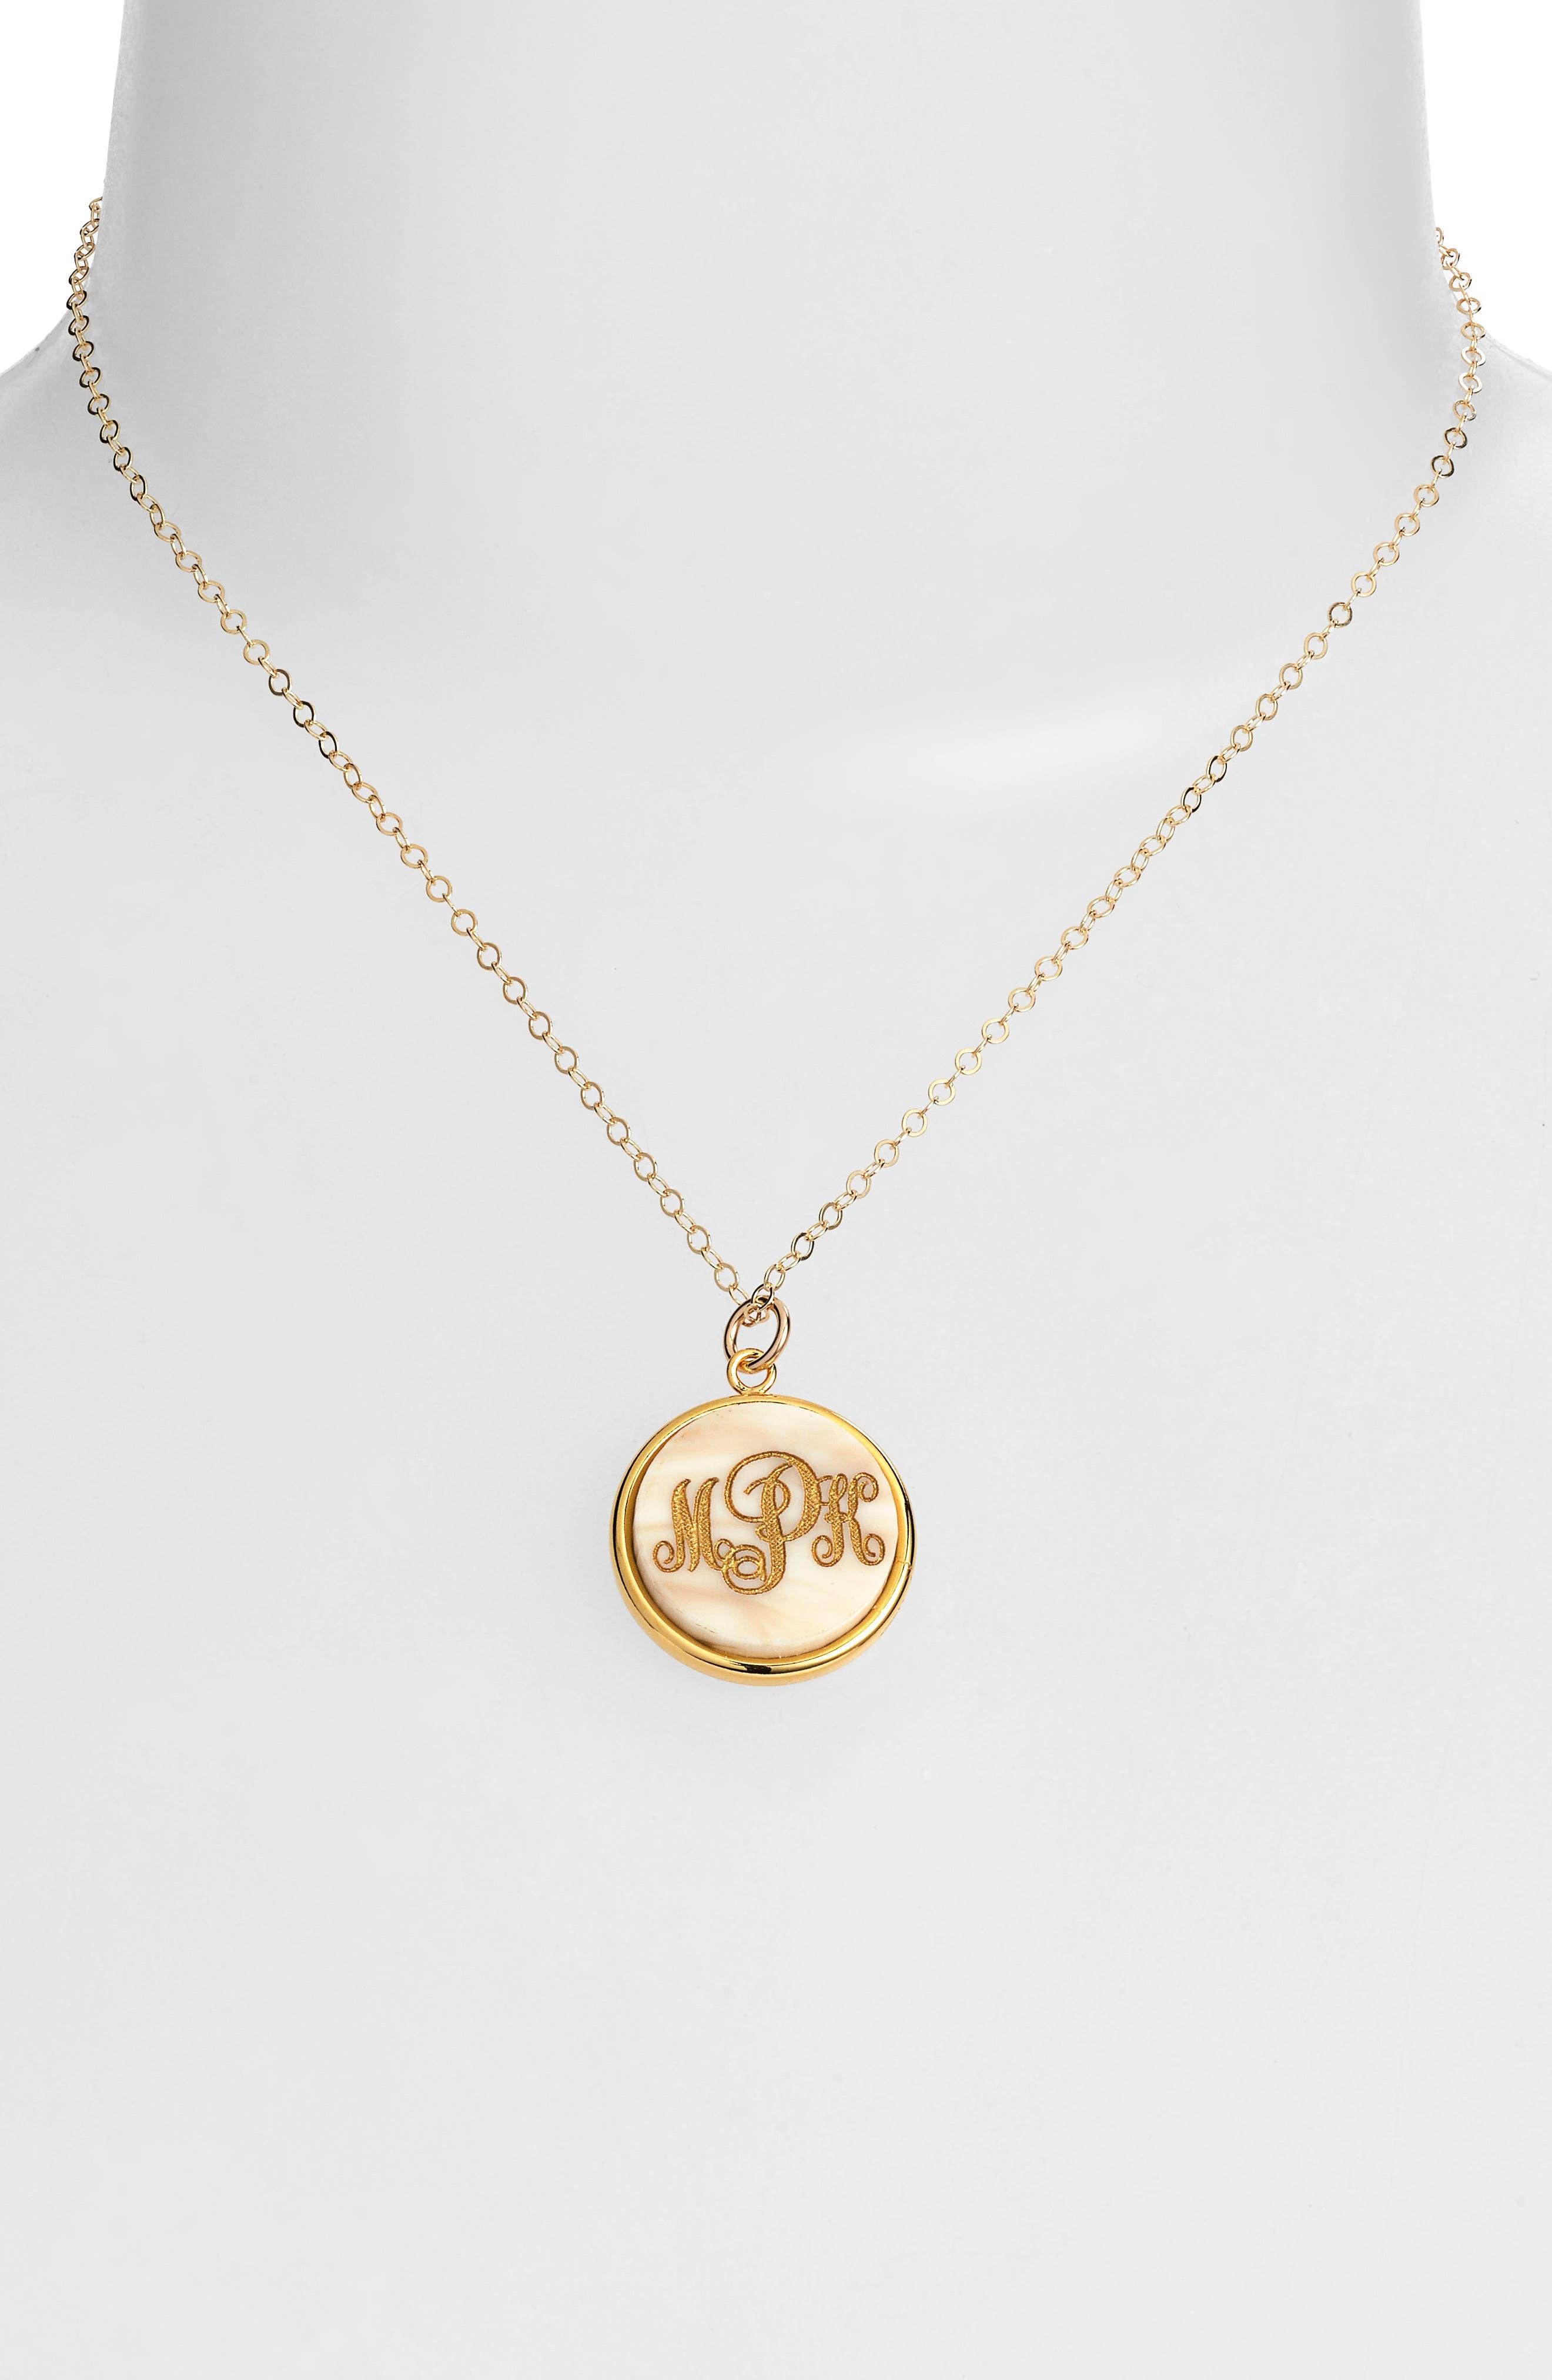 'Vineyard' Personalized Monogram Pendant Necklace,                             Alternate thumbnail 4, color,                             900